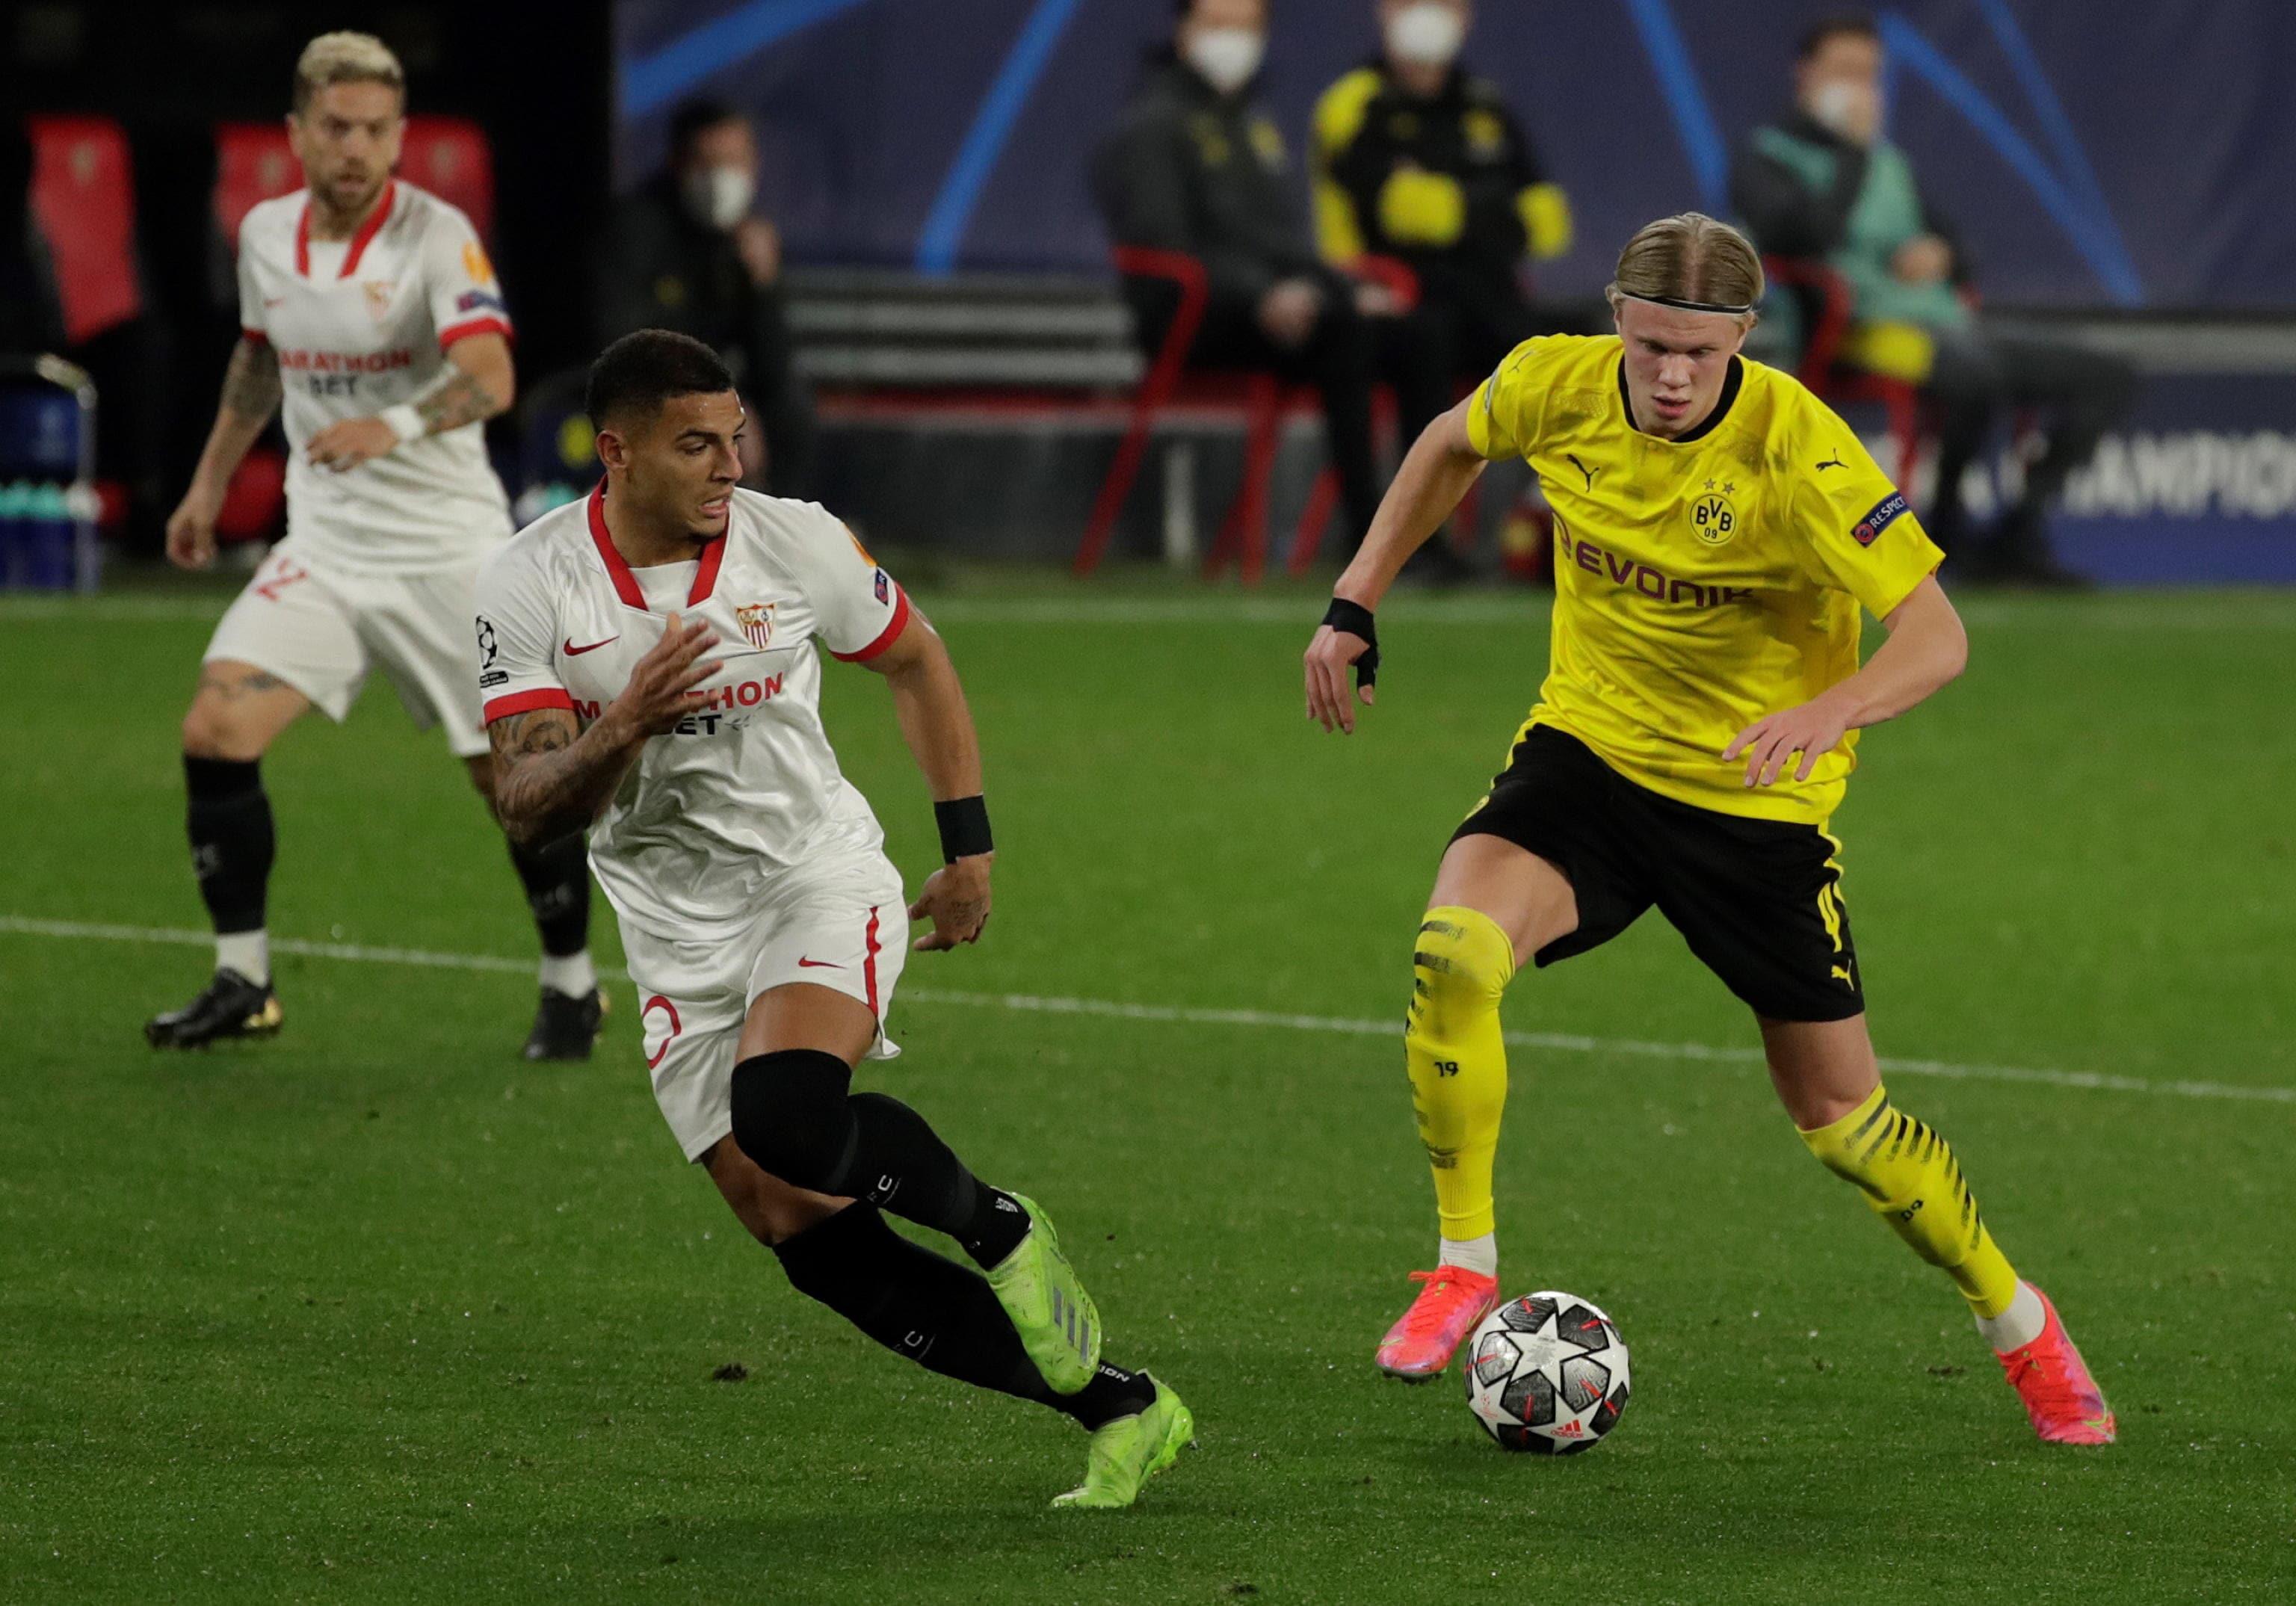 Champions, Siviglia-Borussia Dortmund 2-3: video, gol e highlights